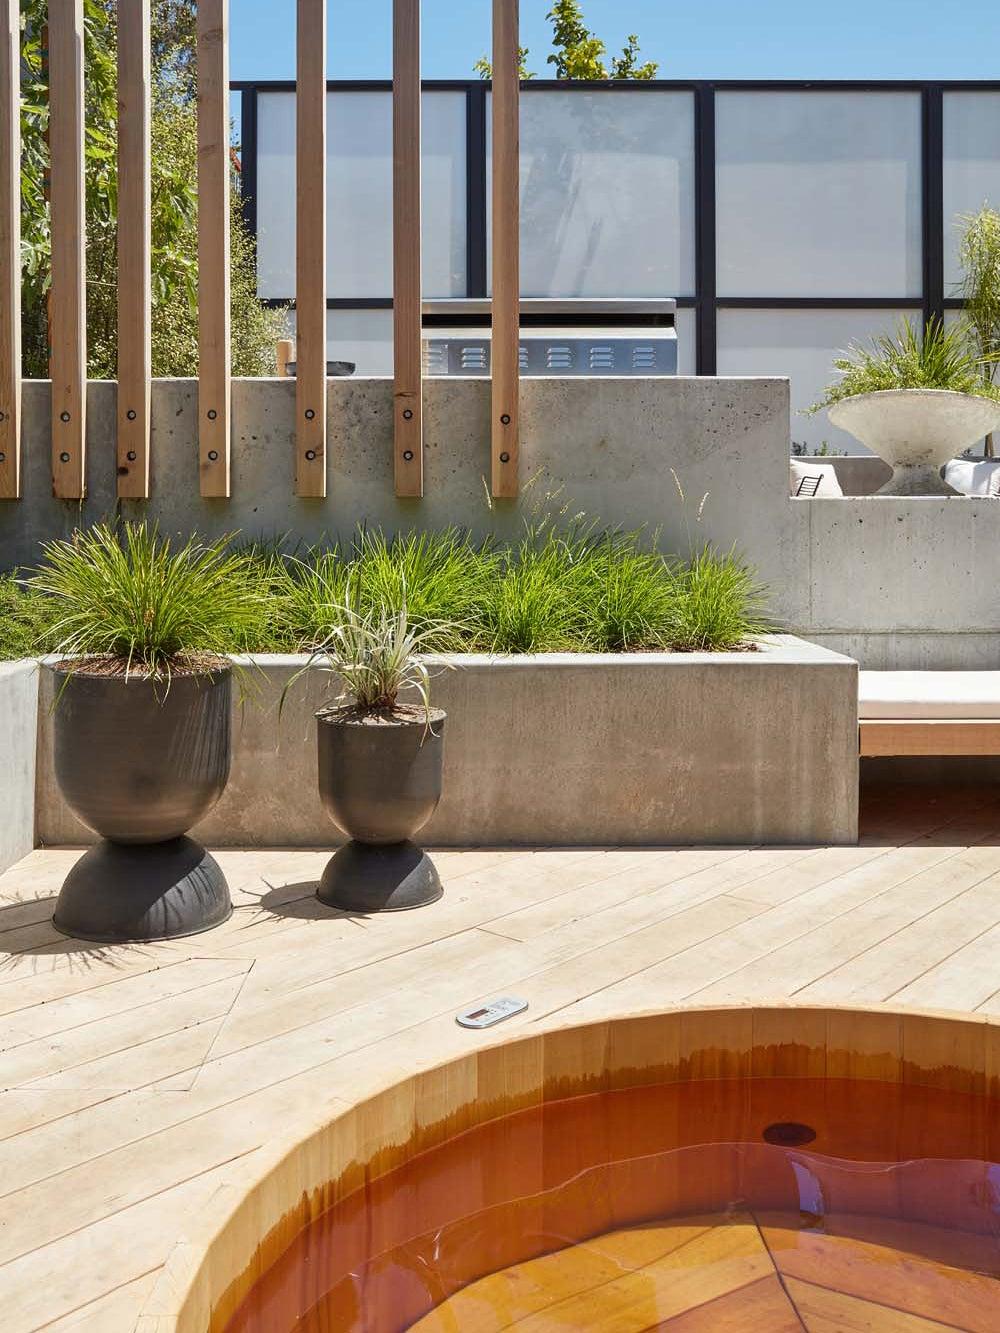 Erin Hiemstra's Japanese soak tub